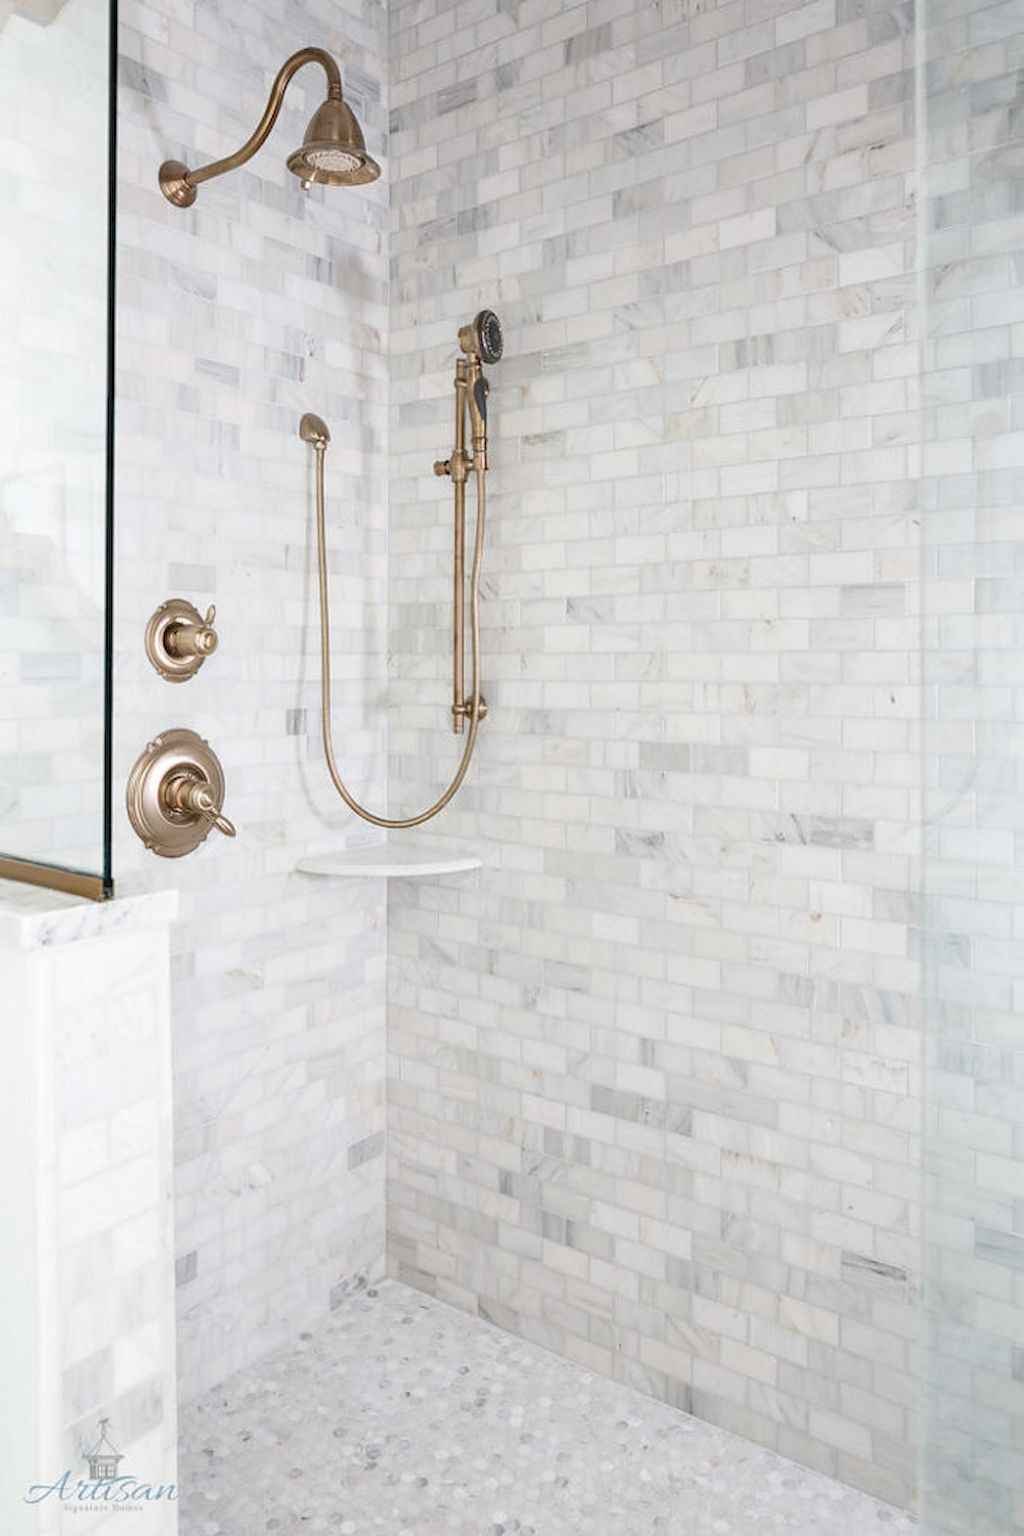 50 beautiful bathroom shower tile ideas (2) - Roomadness.com